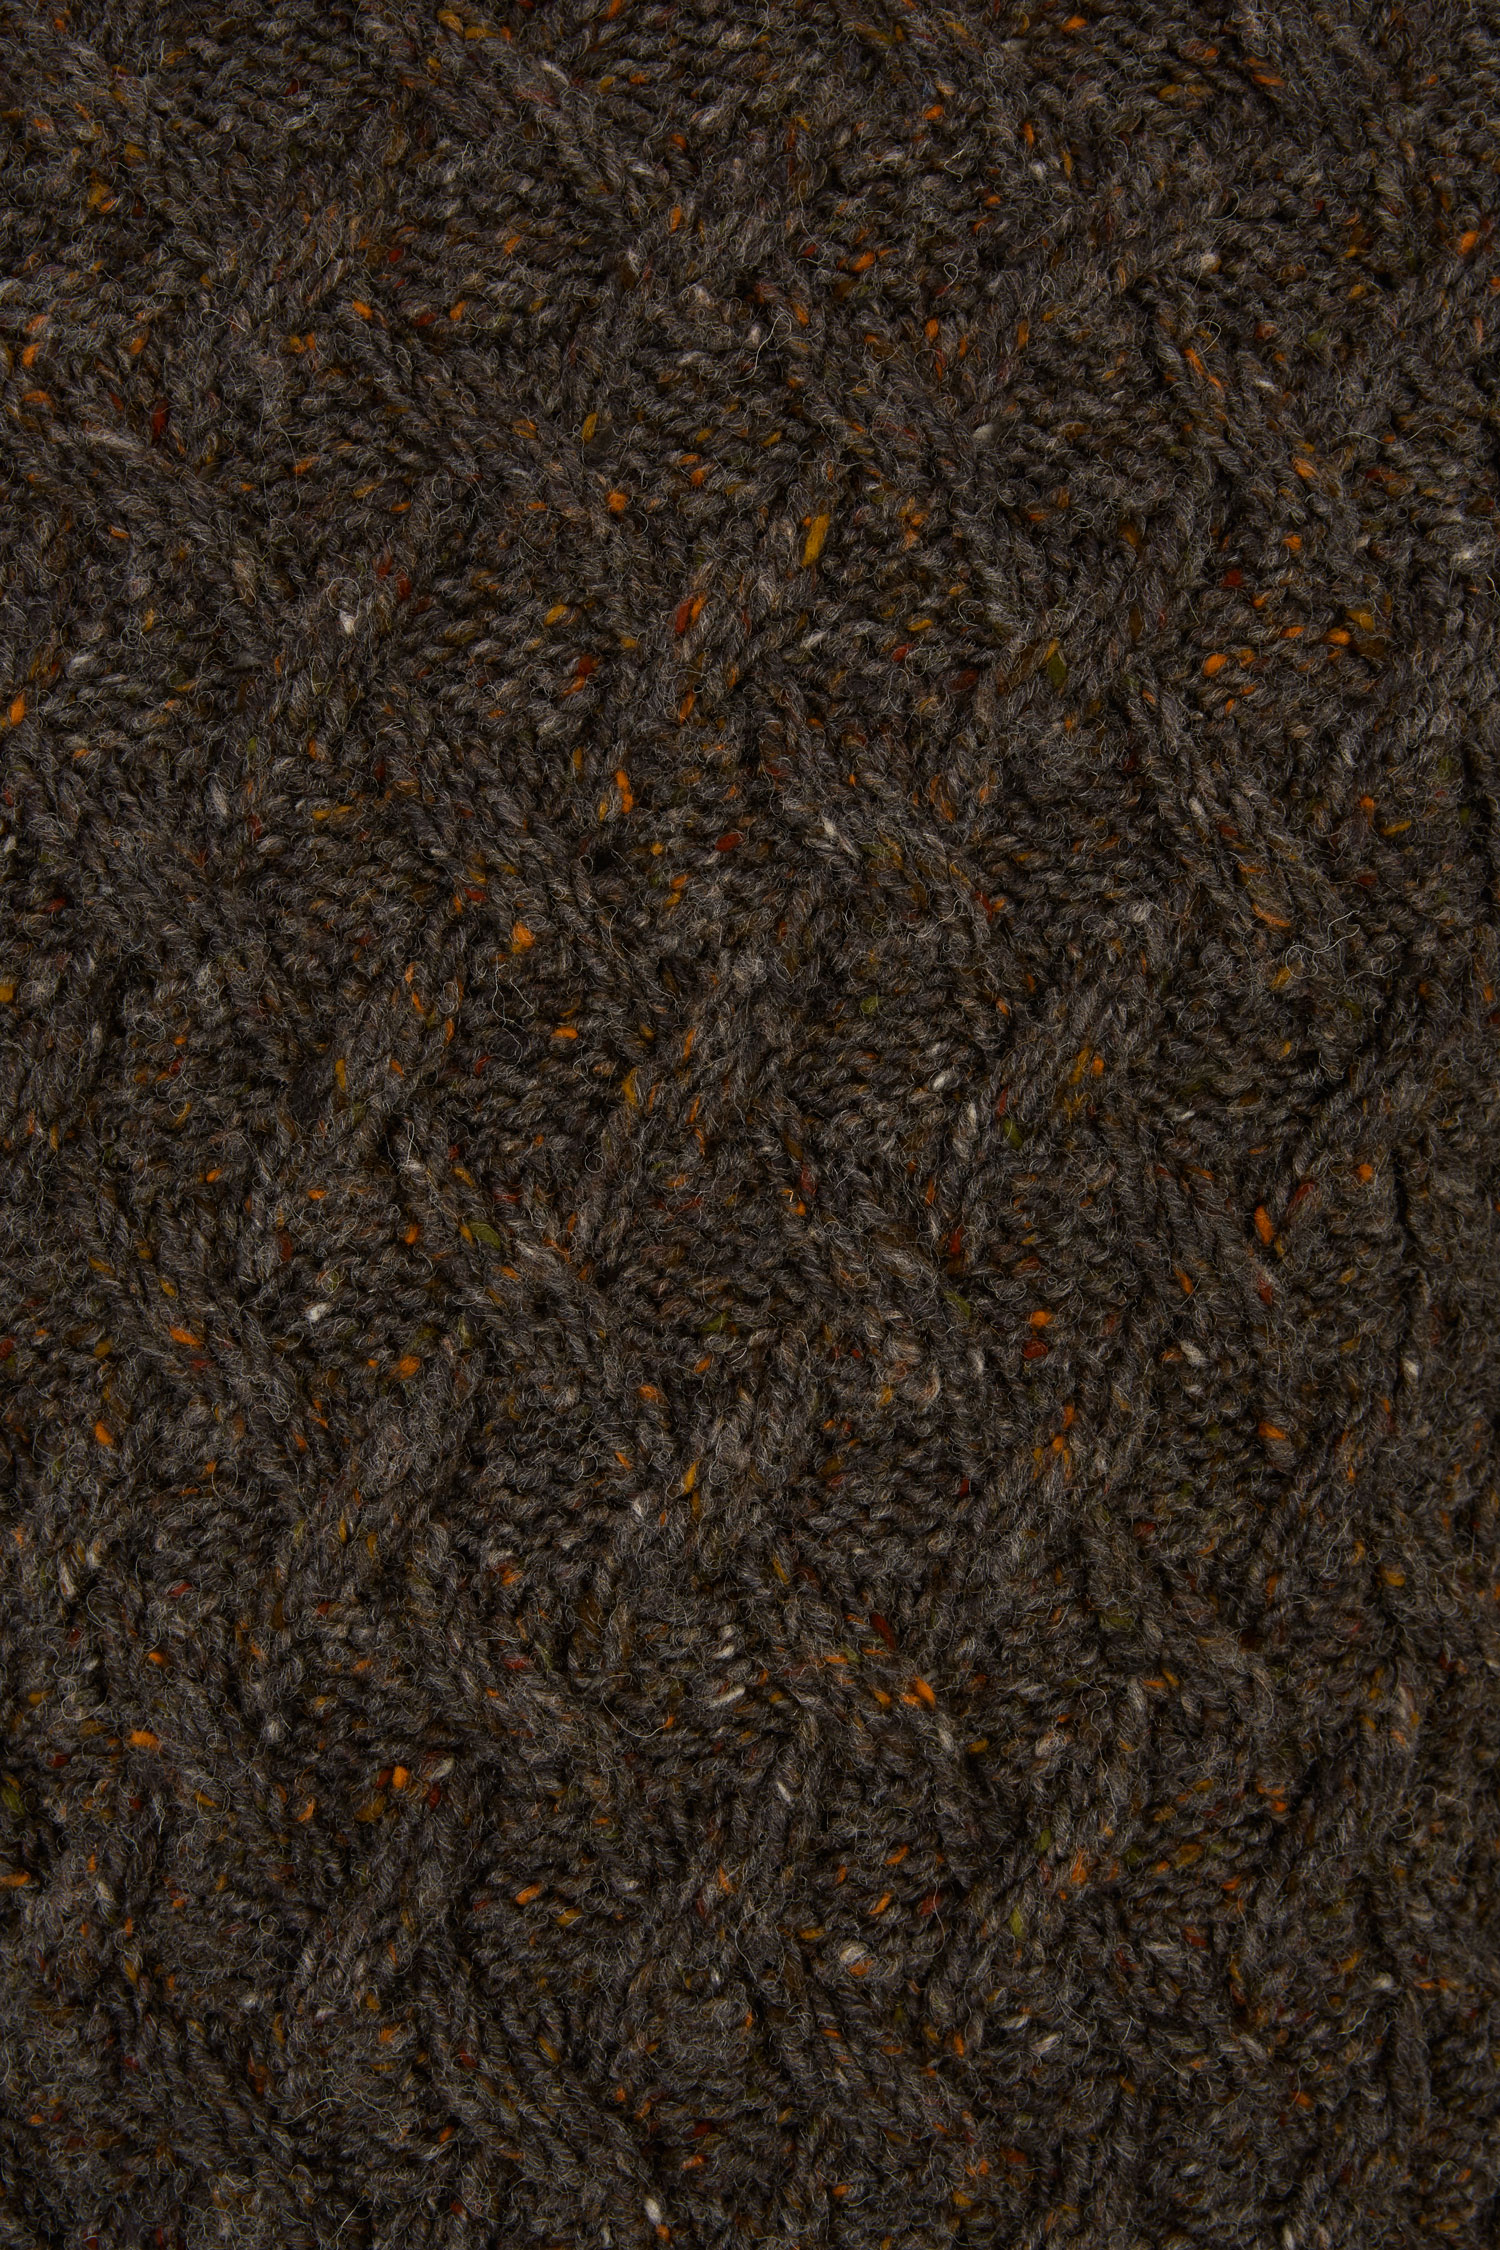 Sweater_M18-14_Achill Aran_5 Variations_Conker_03_PRO SHOT_WEB RES.jpg